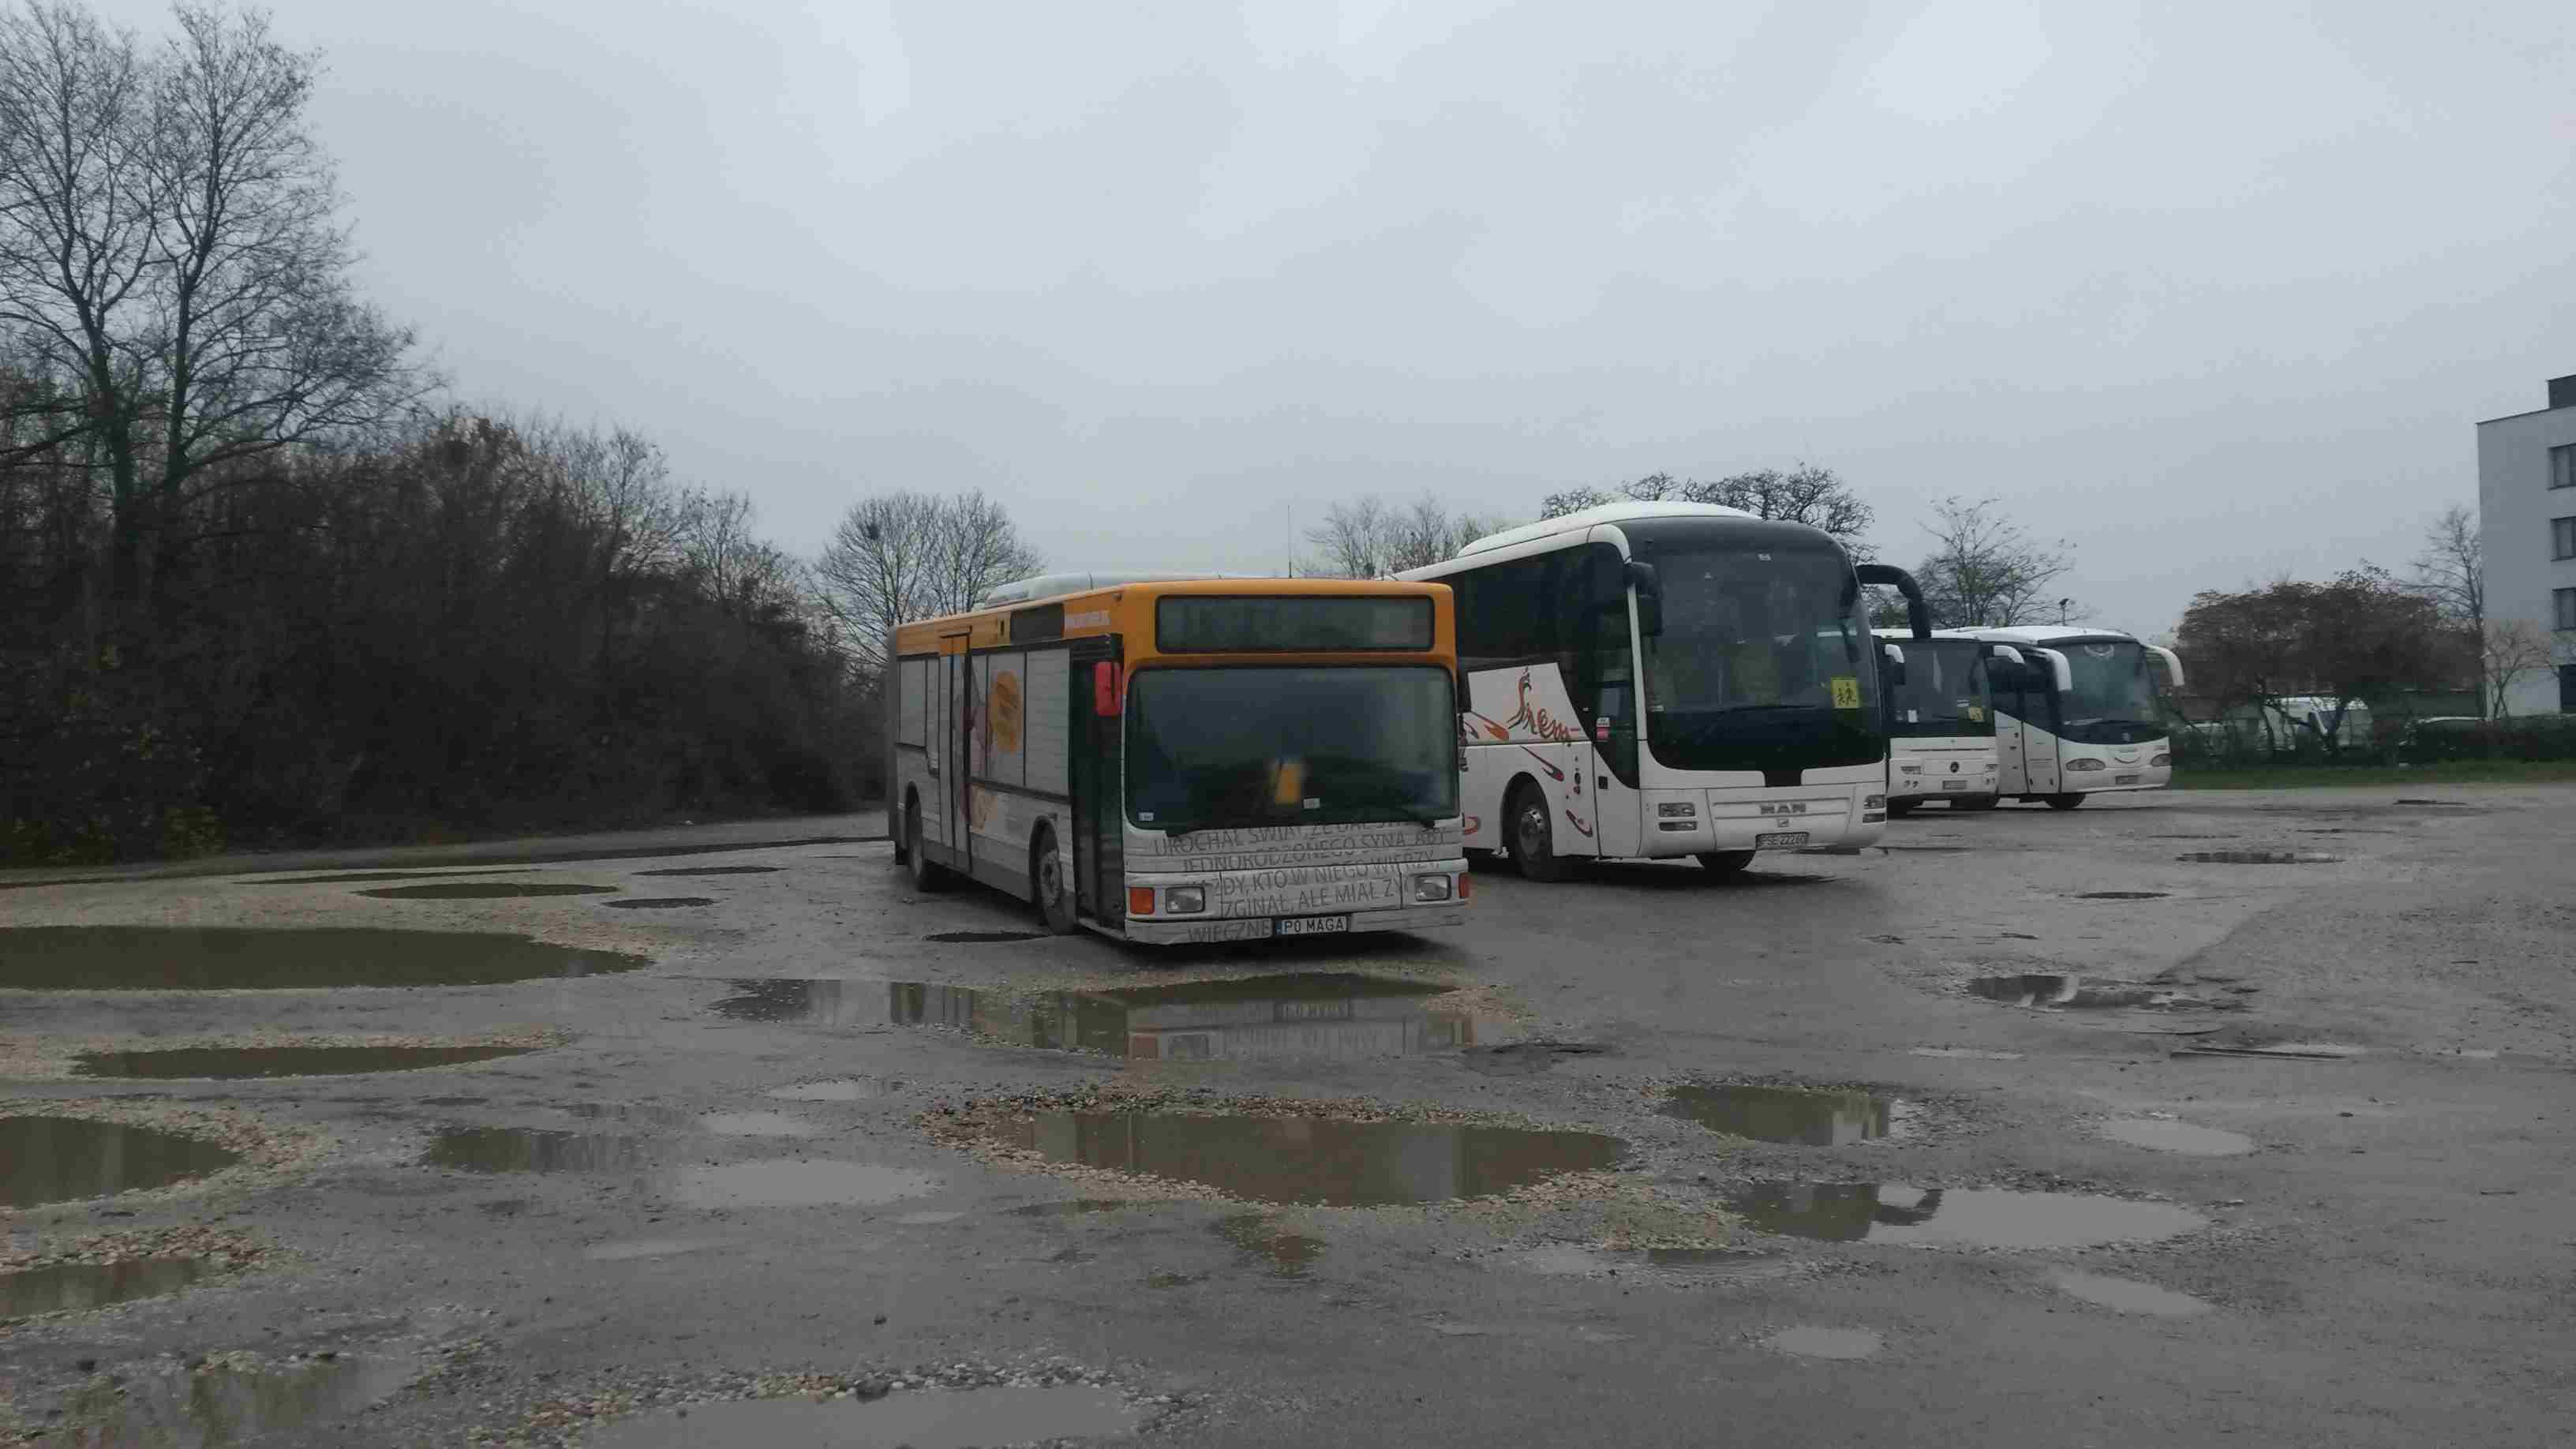 Autobus pomoc bezdomnym Poznań - Jacek Butlewski